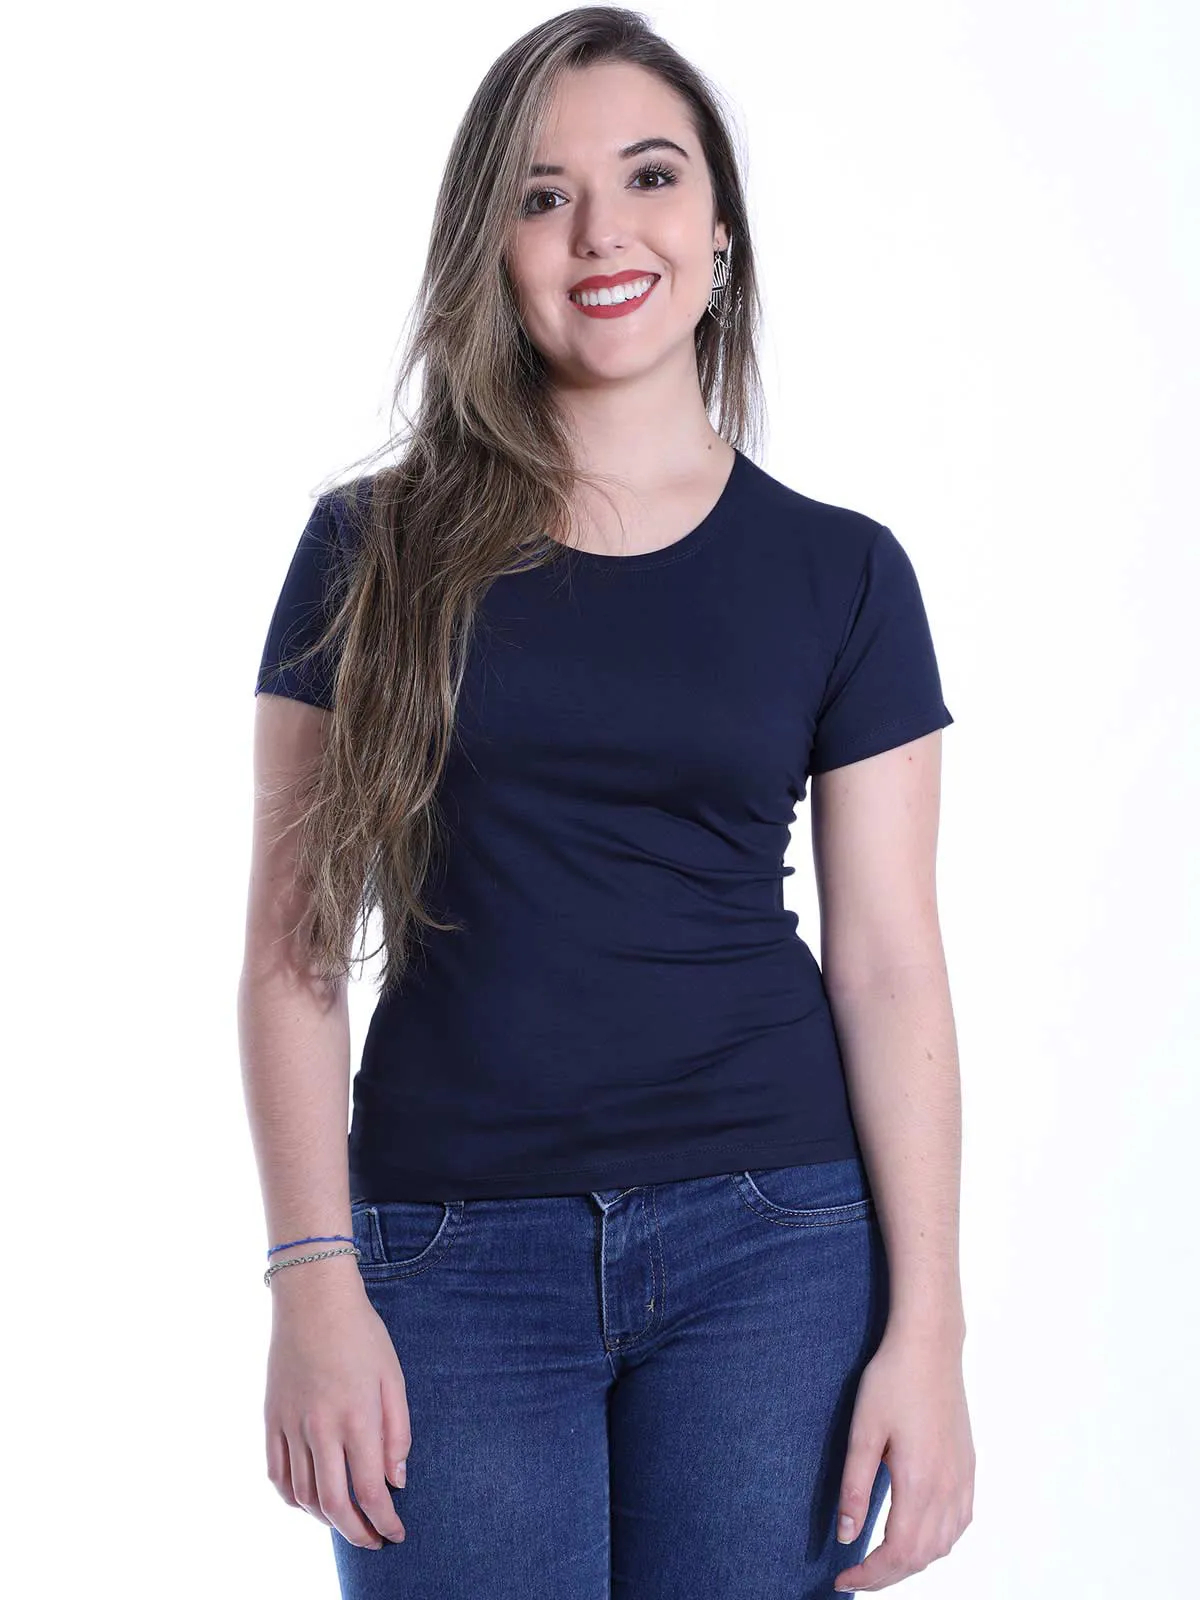 Baby Look Feminina Básica Lisa Viscolycra Decote Redondo Azul Marinho